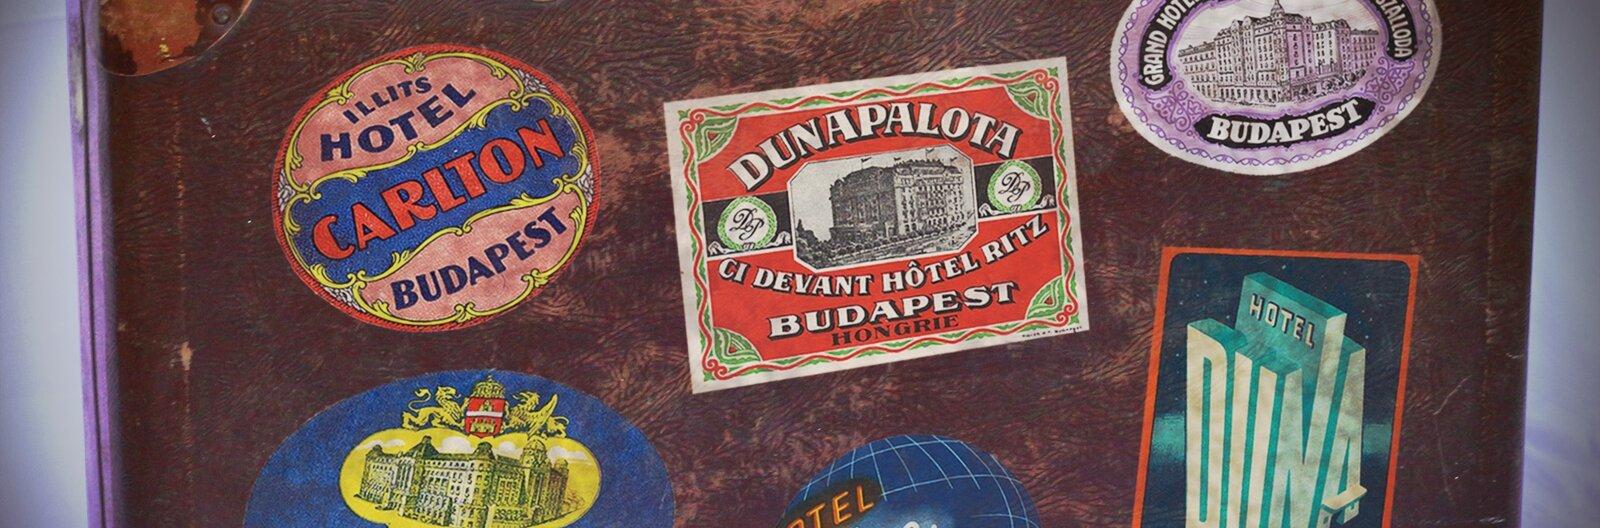 Budapesti koffermatricák a múltból